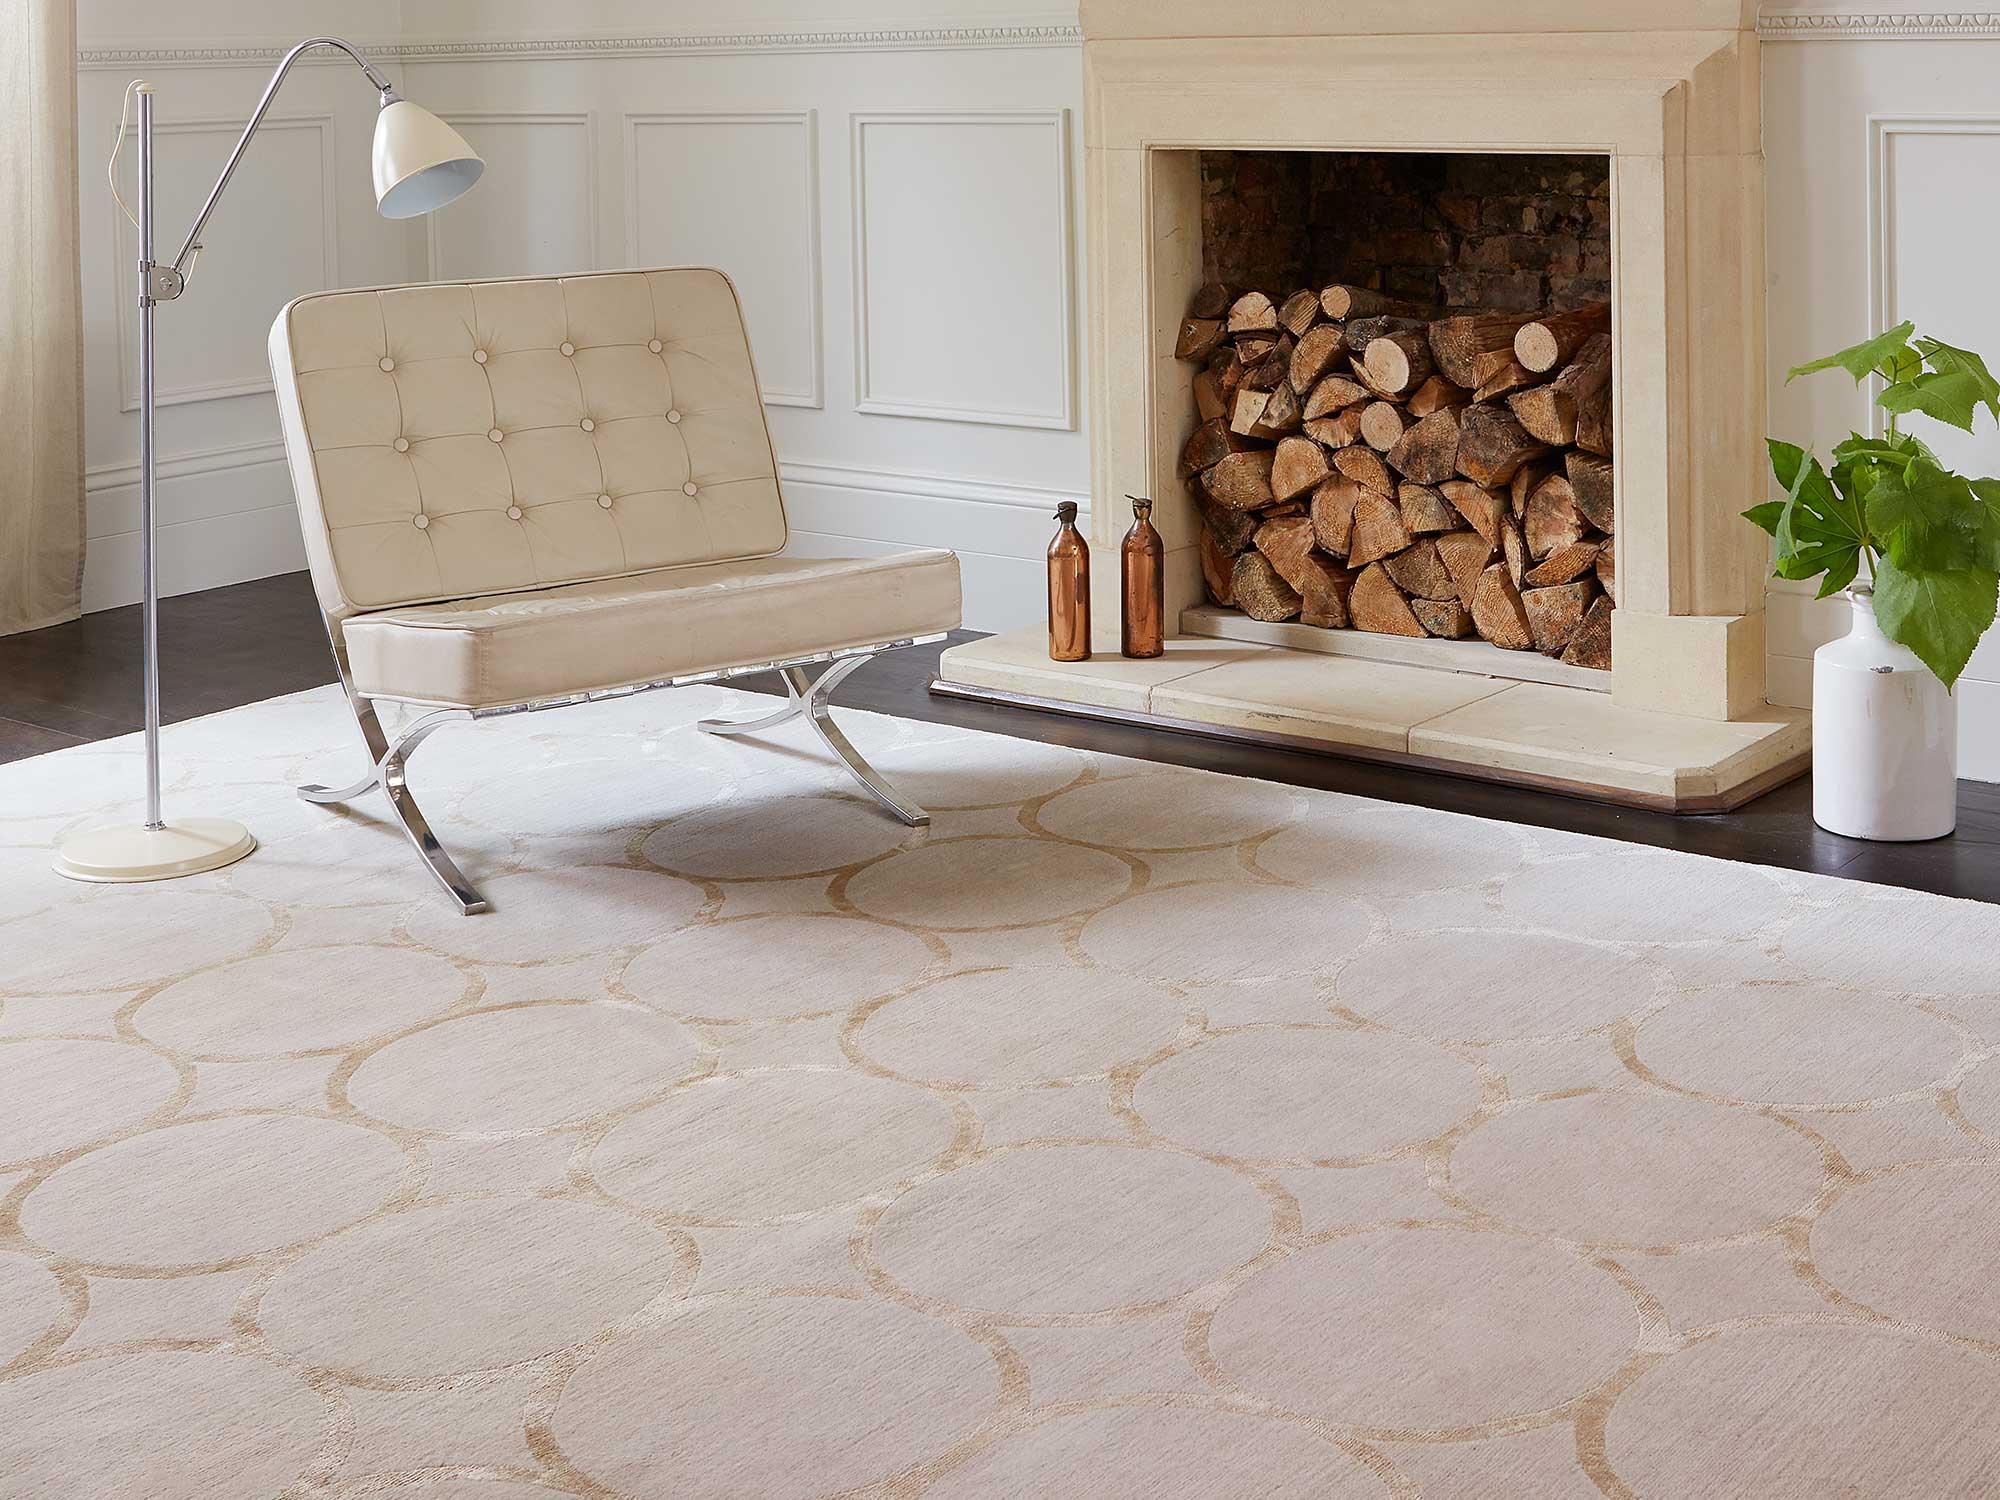 Jacaranda Rugs Gainsborough Carpets And Flooring